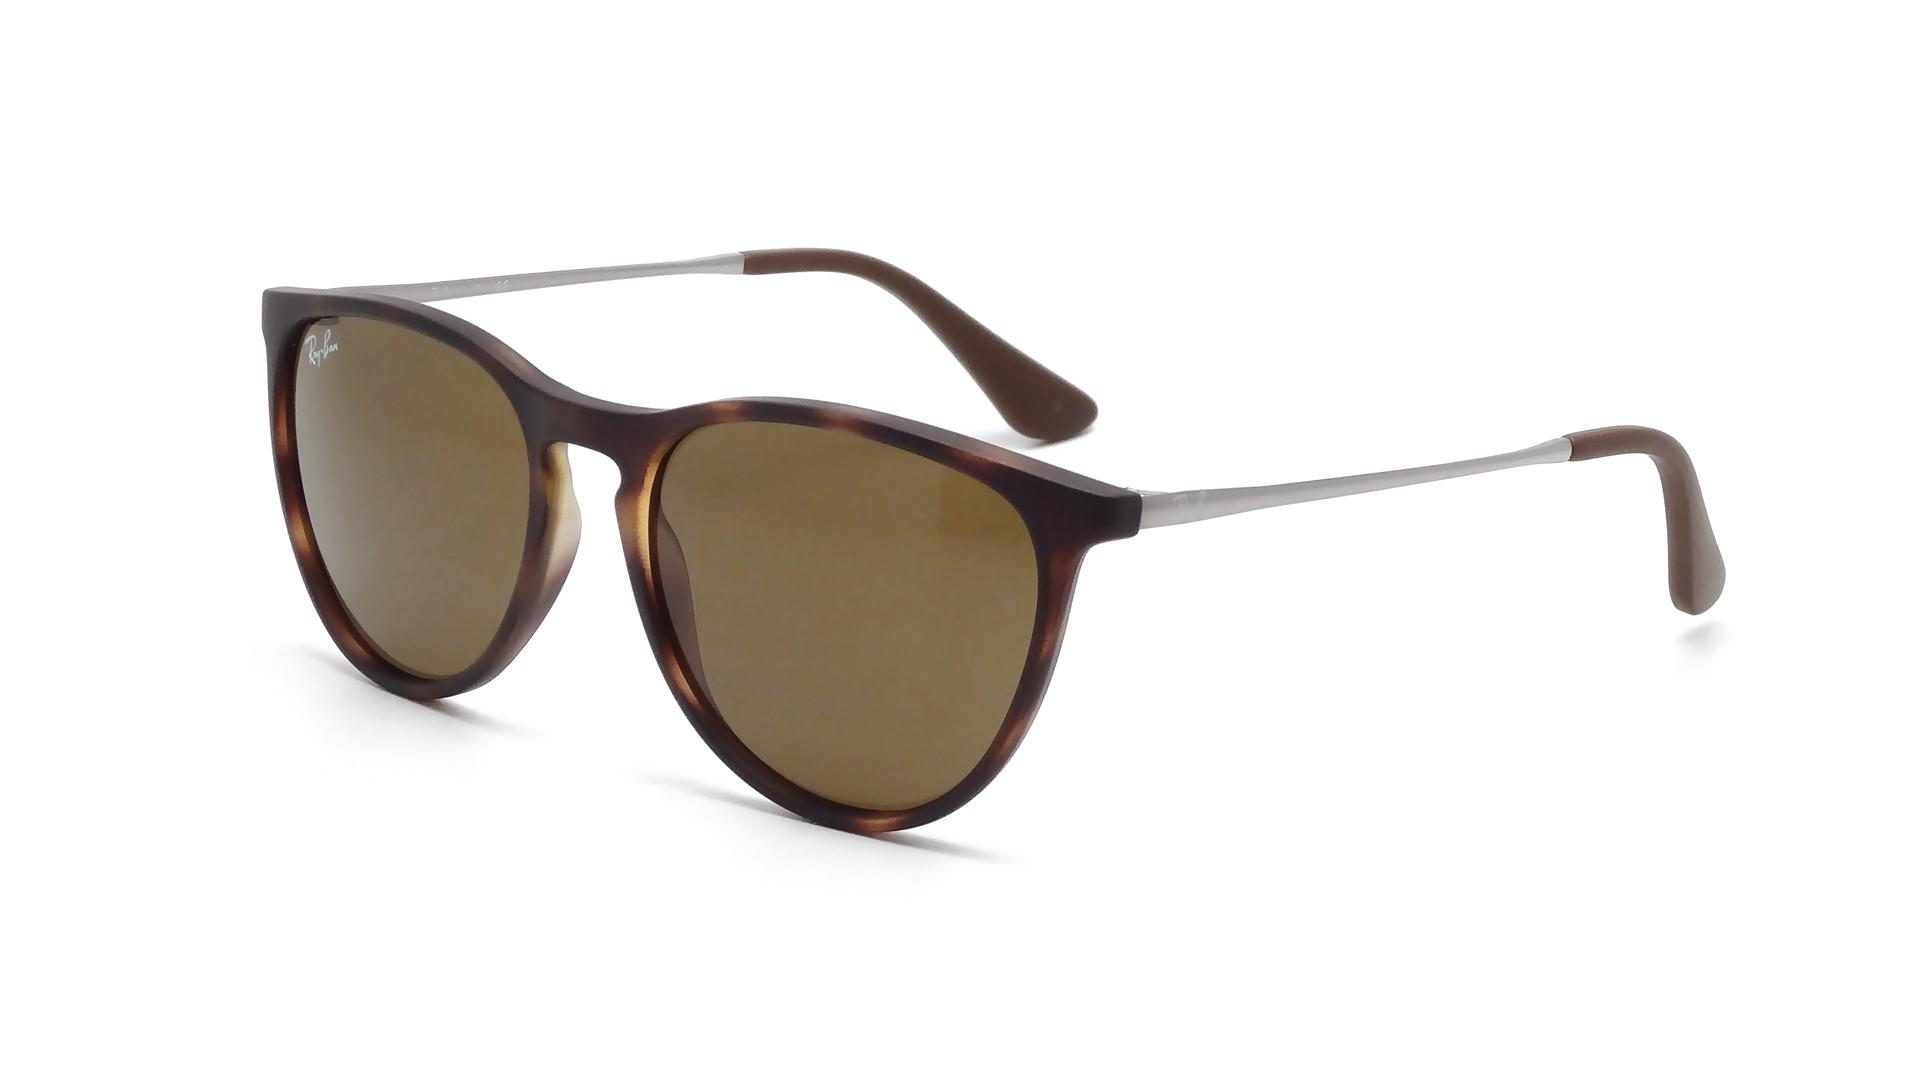 lunettes de soleil ray ban grande taille. Black Bedroom Furniture Sets. Home Design Ideas